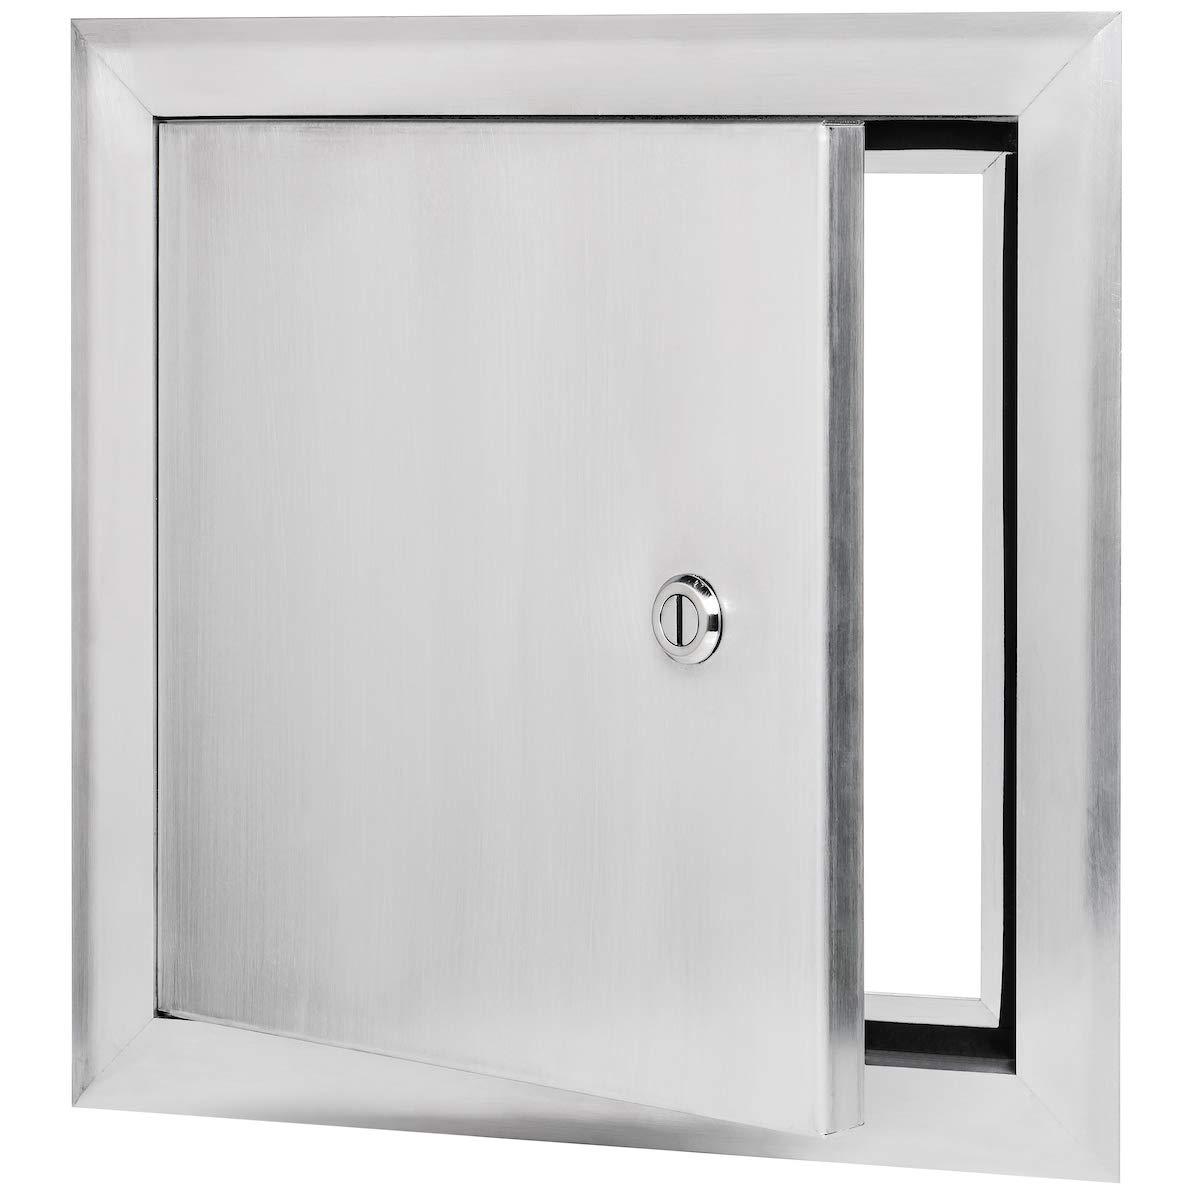 Keyed Cylinder Latch Premier 2400 Series Aluminum Universal Access Door 14 x 14